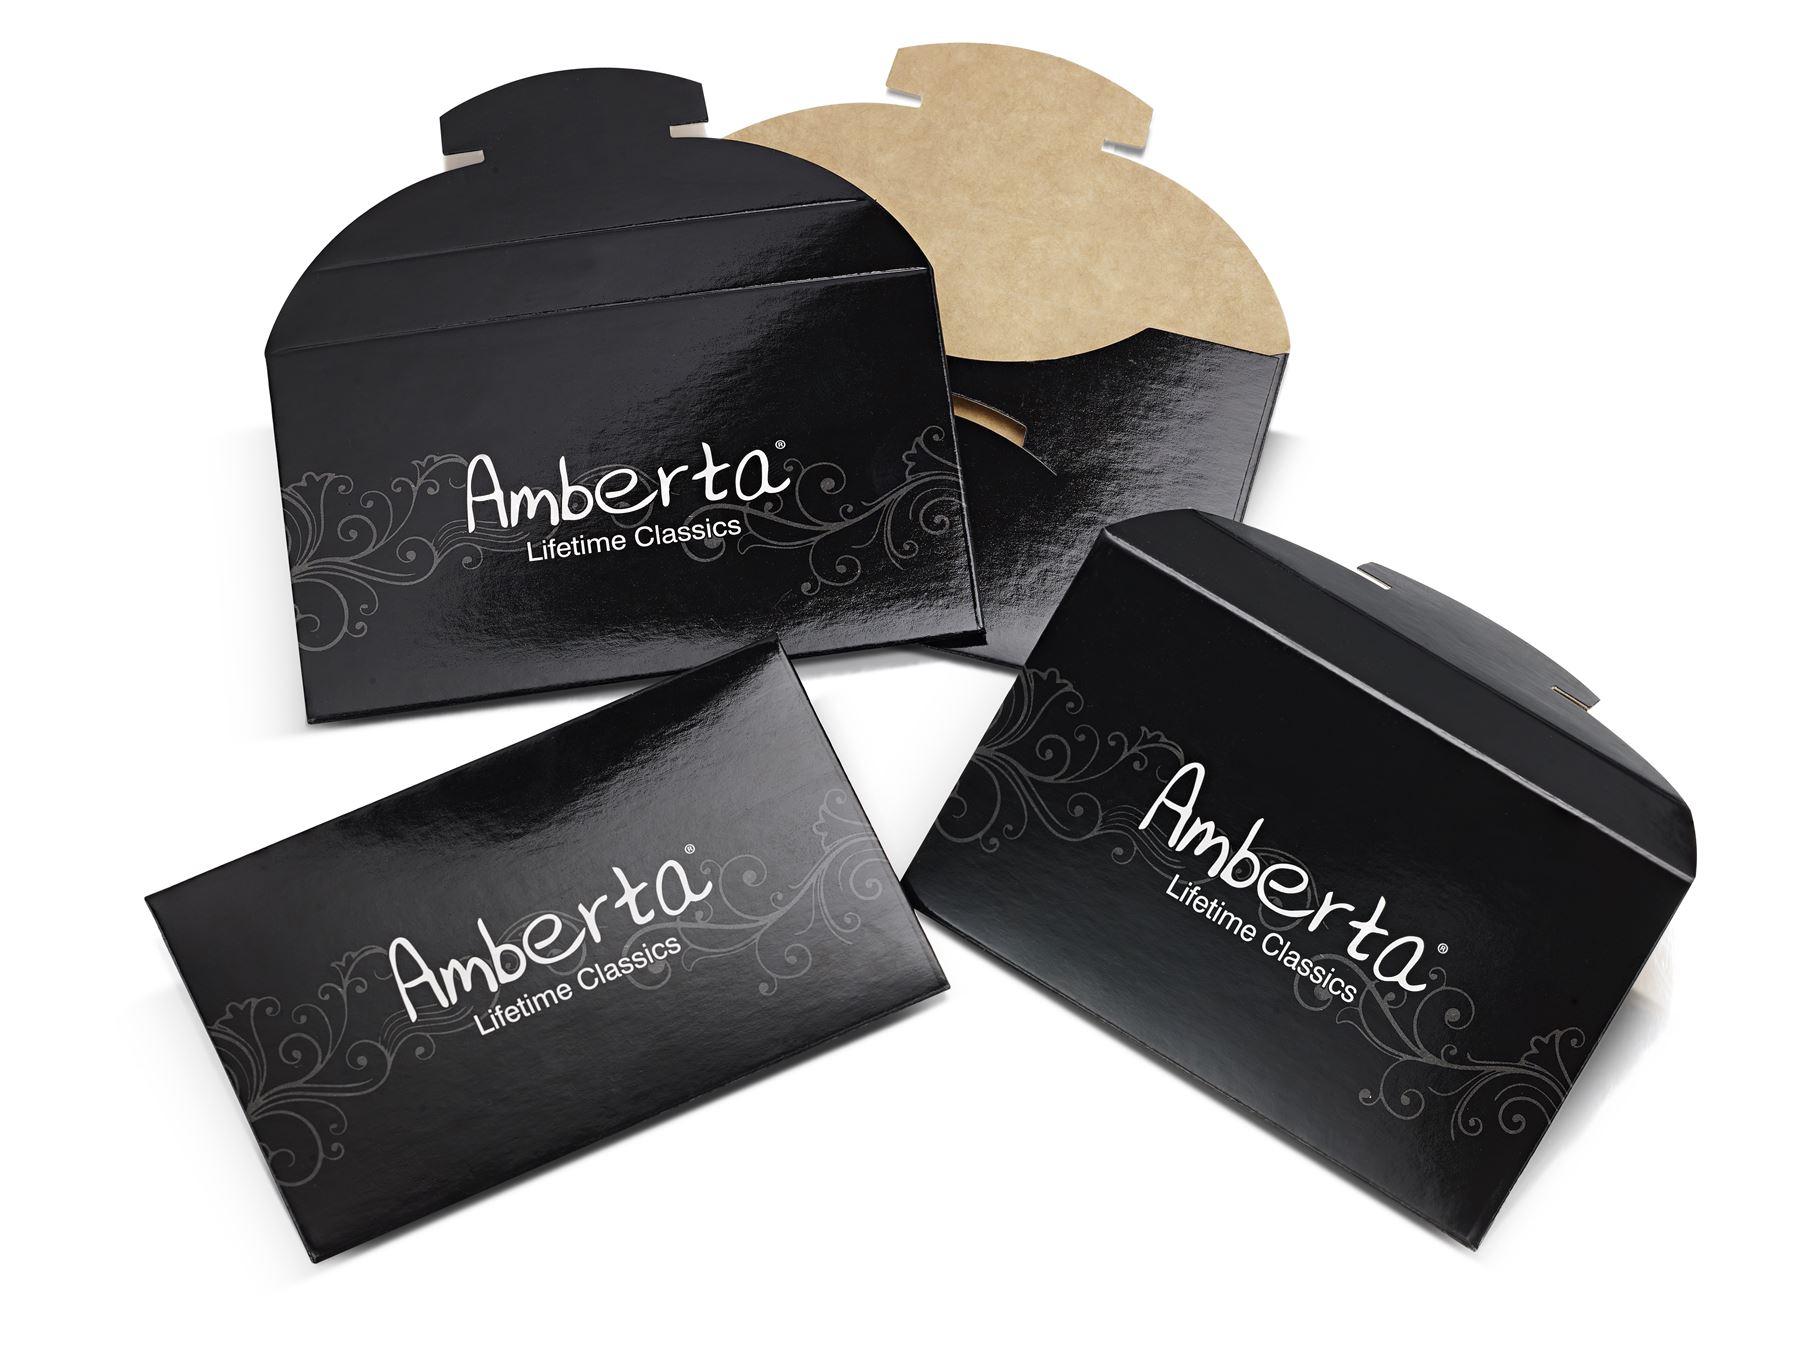 Amberta-Jewelry-925-Sterling-Silver-Adjustable-Bracelet-Italian-Bangle-for-Women thumbnail 52